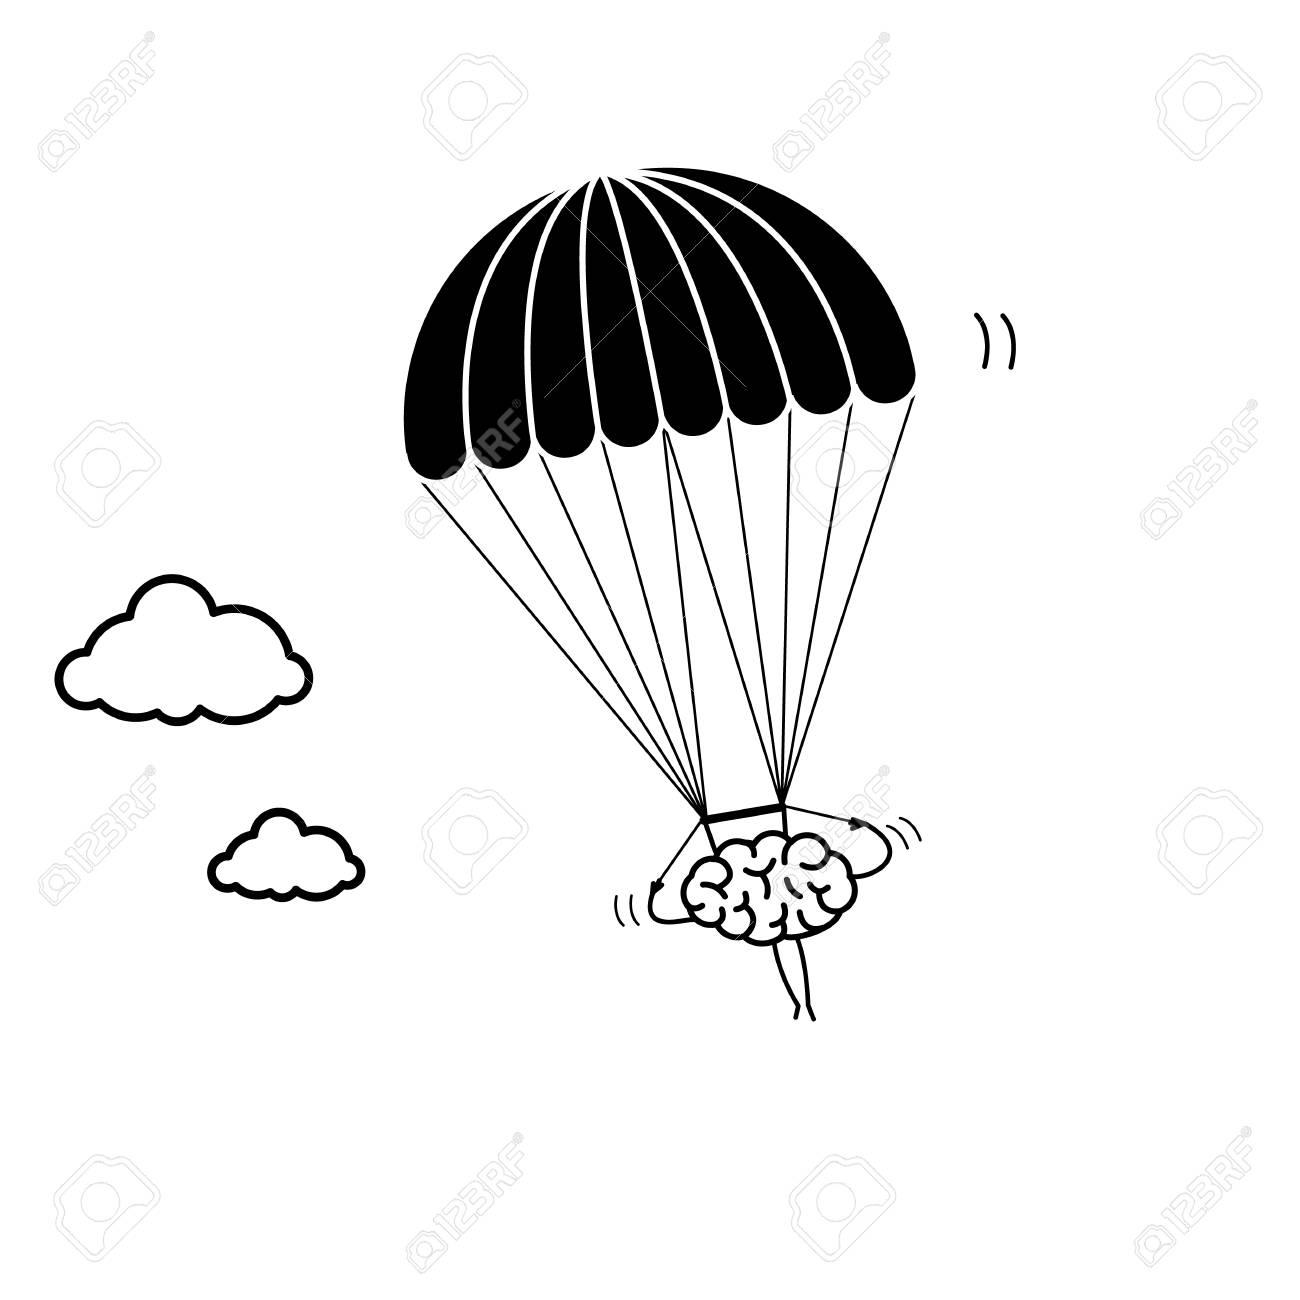 brain flying on parachute vector concept illustration of inventive rh 123rf com parachute vector image parachute vector micron